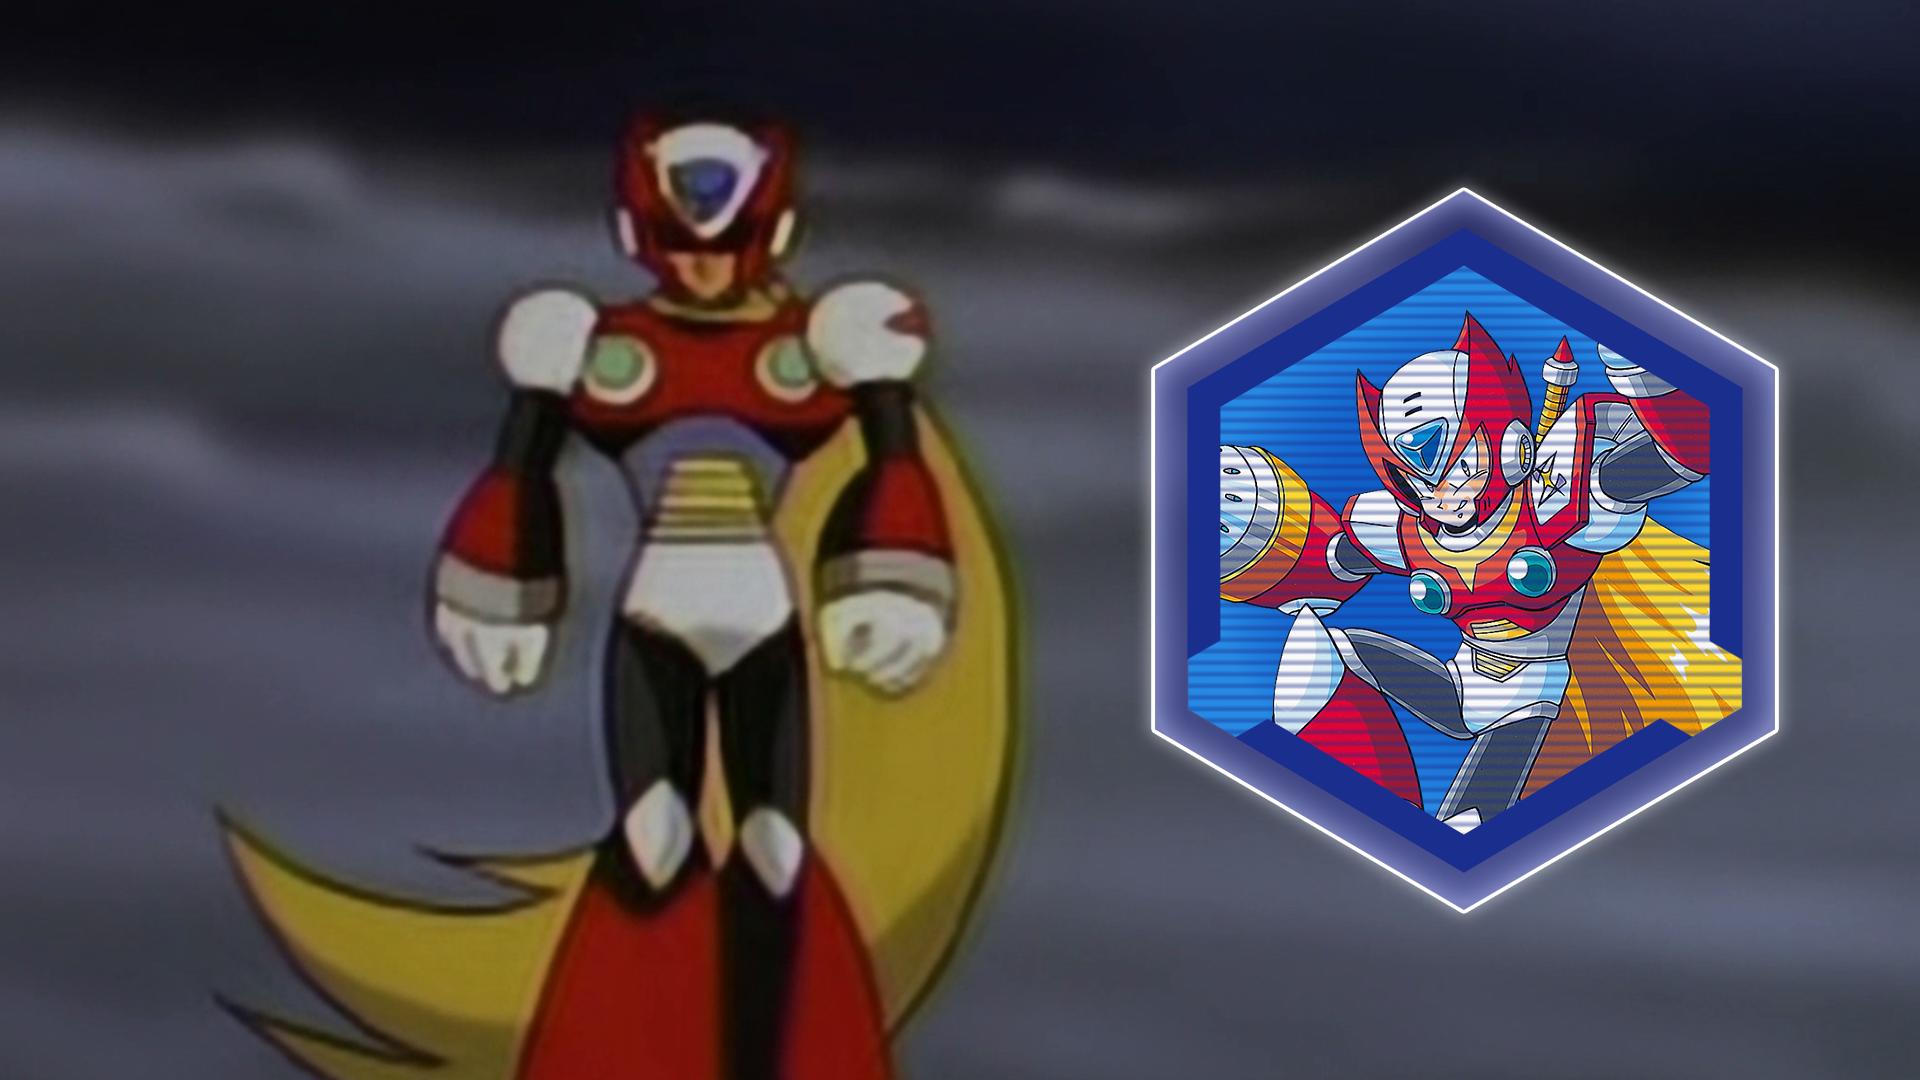 Zero Squared achievement for Mega Man X Legacy Collection on Xbox One